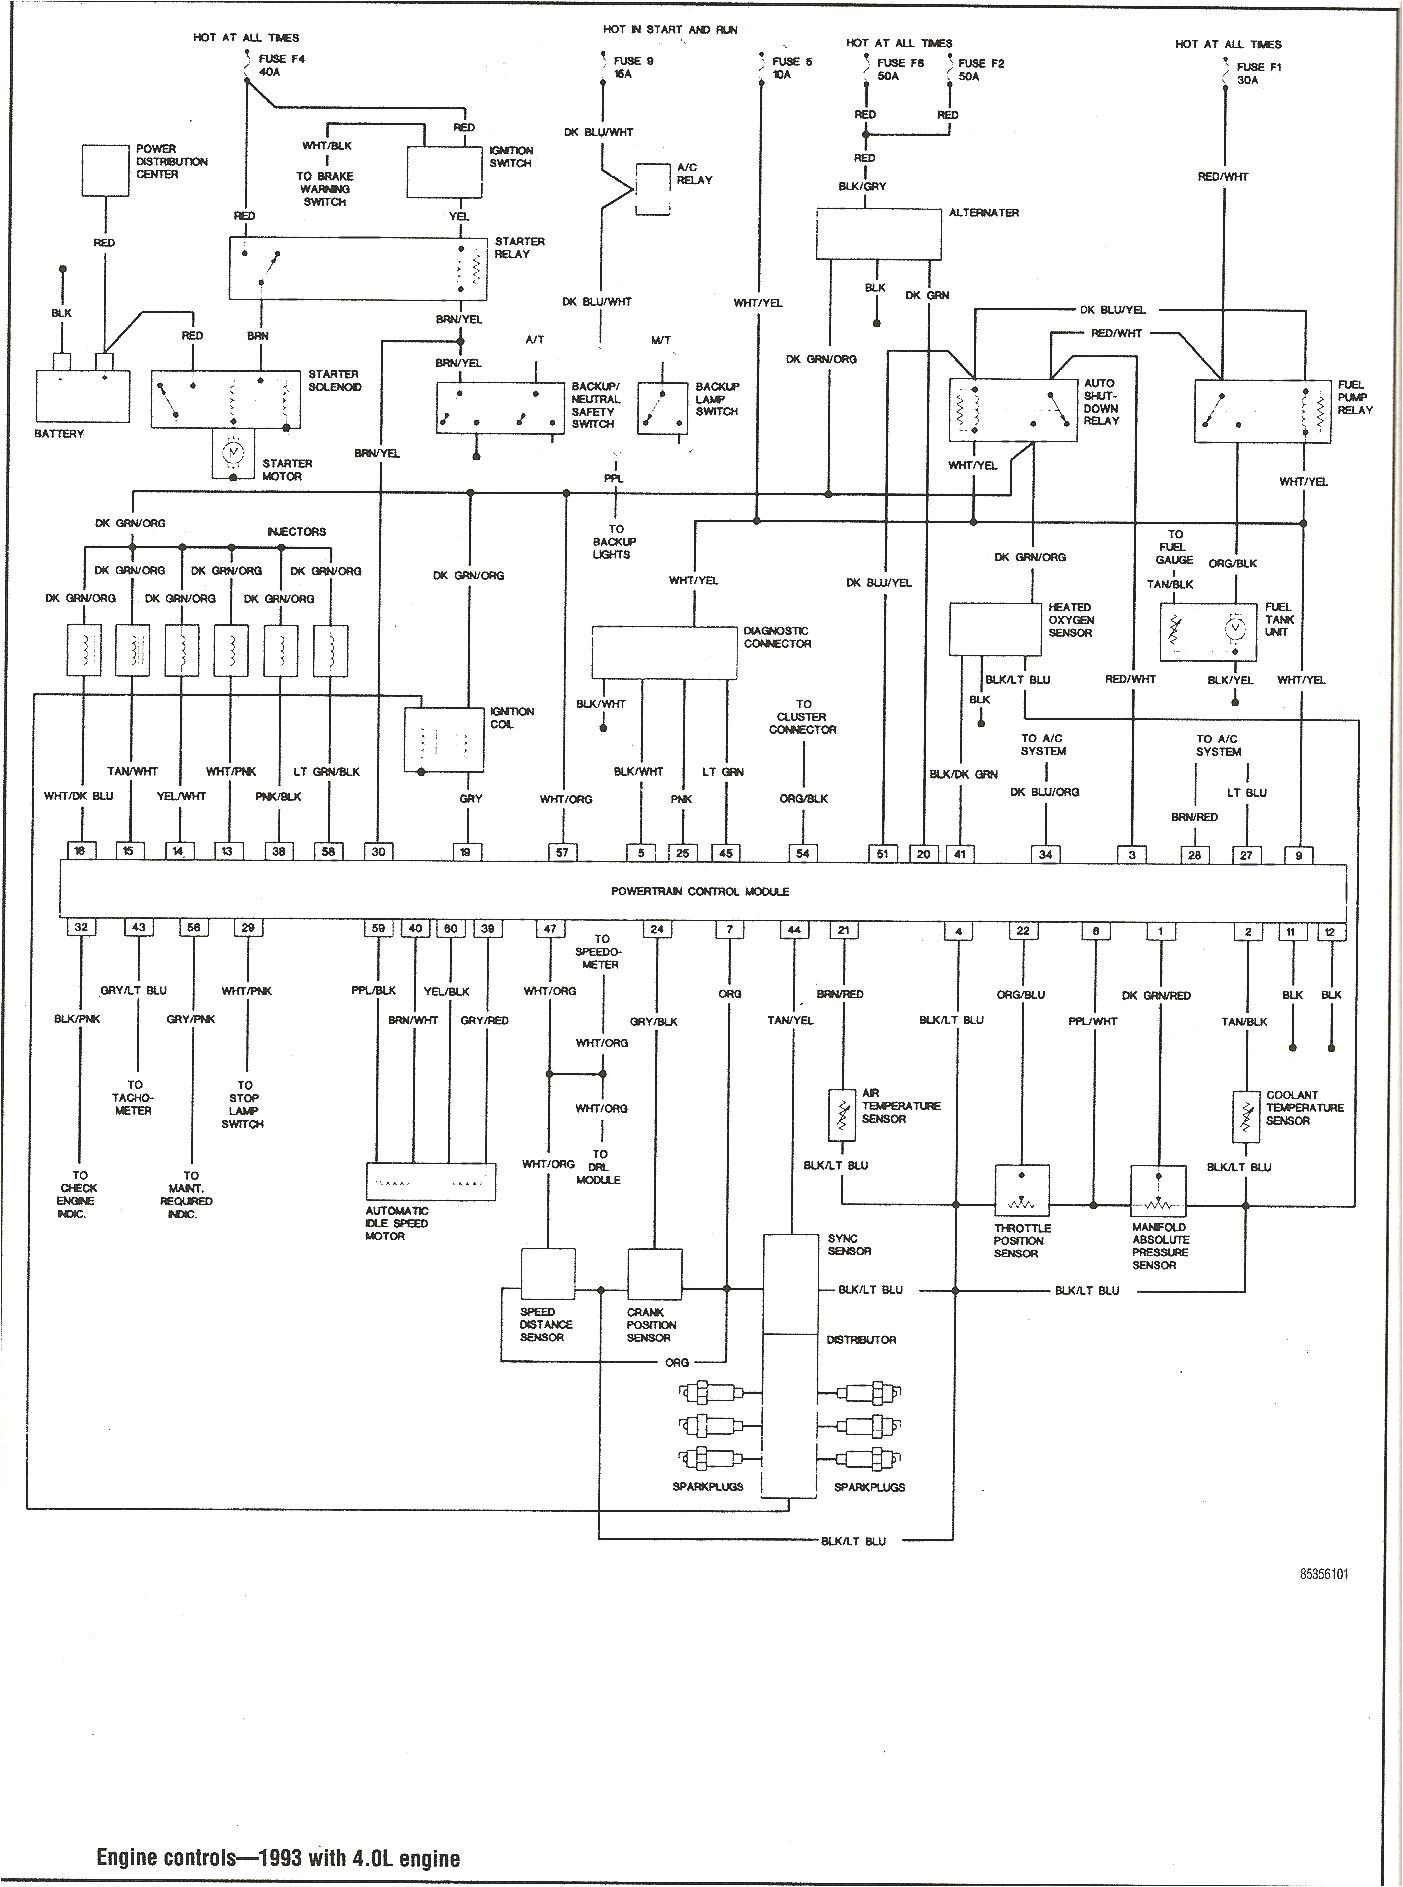 93 jeep wiring diagram wiring diagram 1993 jeep wrangler distributor wiring